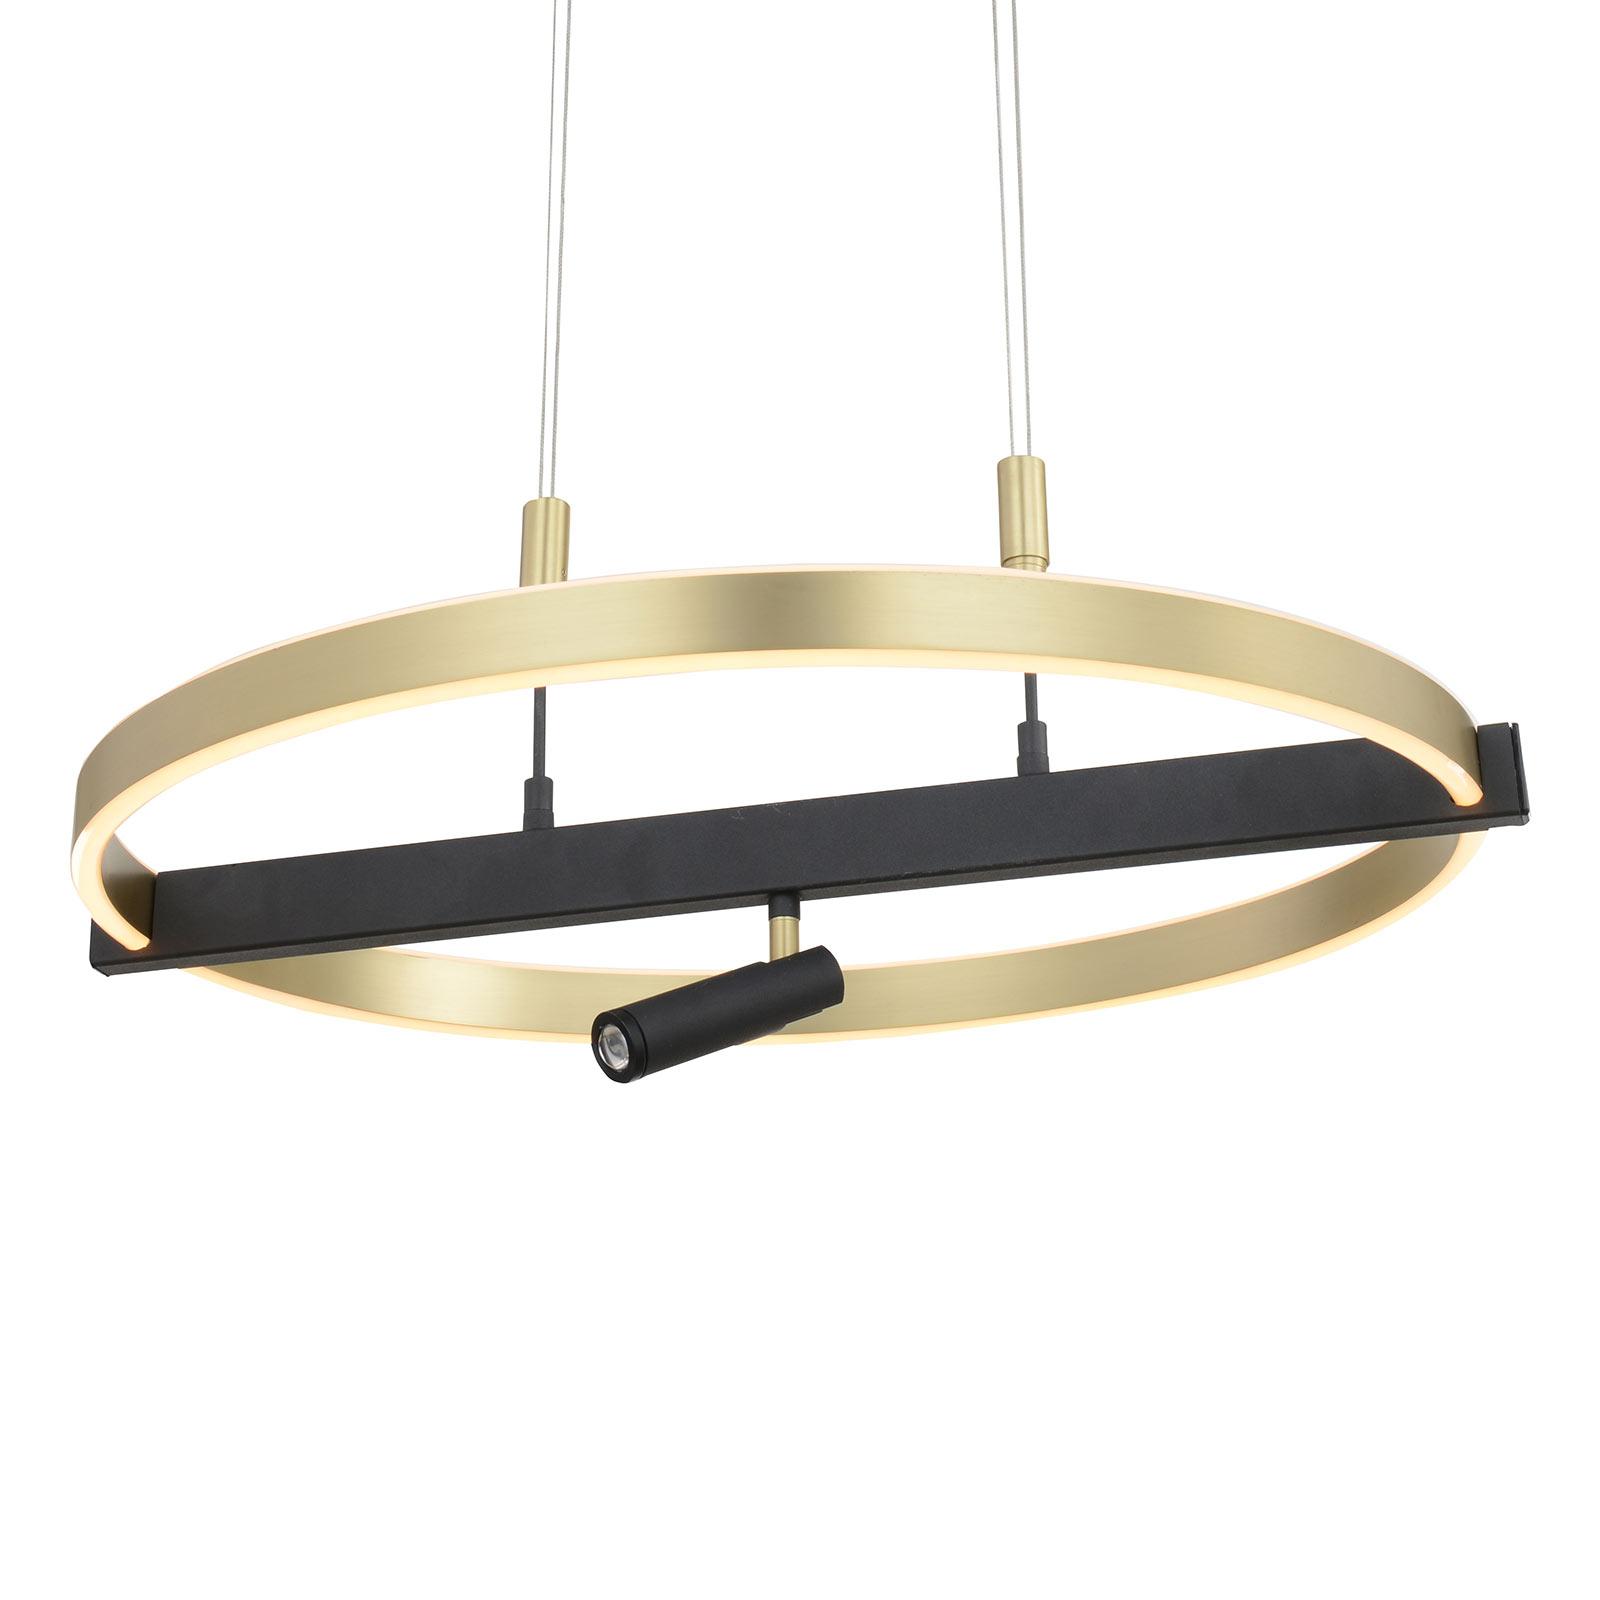 Lucande Matwei lampa wisząca LED, mosiądz